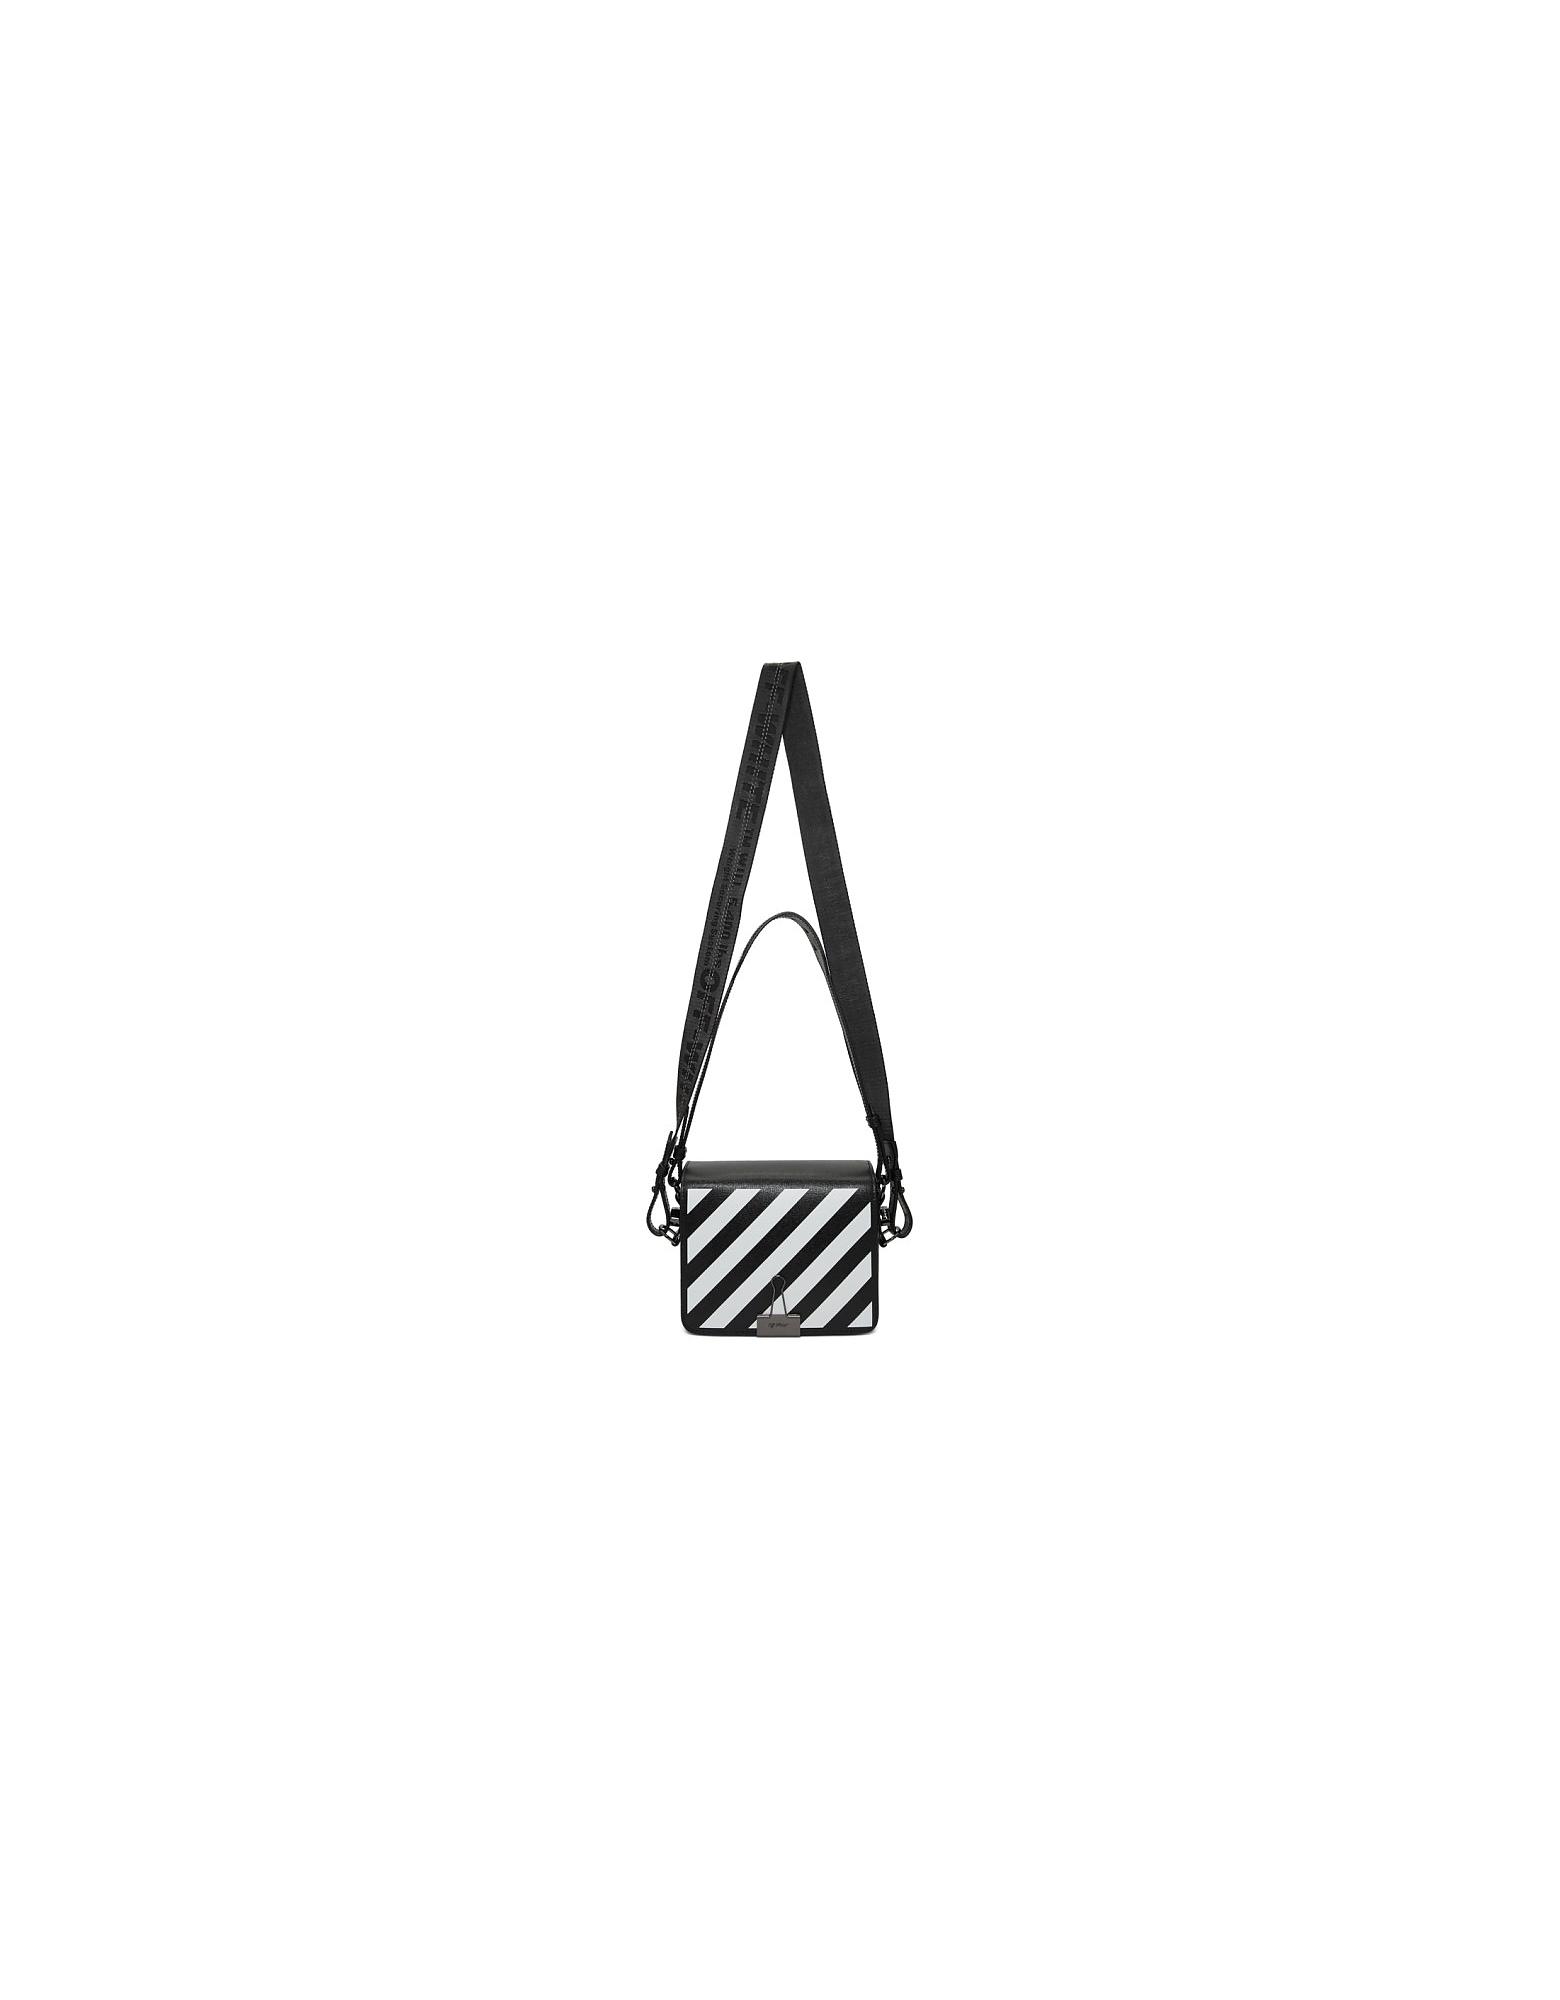 Off-White Designer Handbags, Black Diag Flap Bag